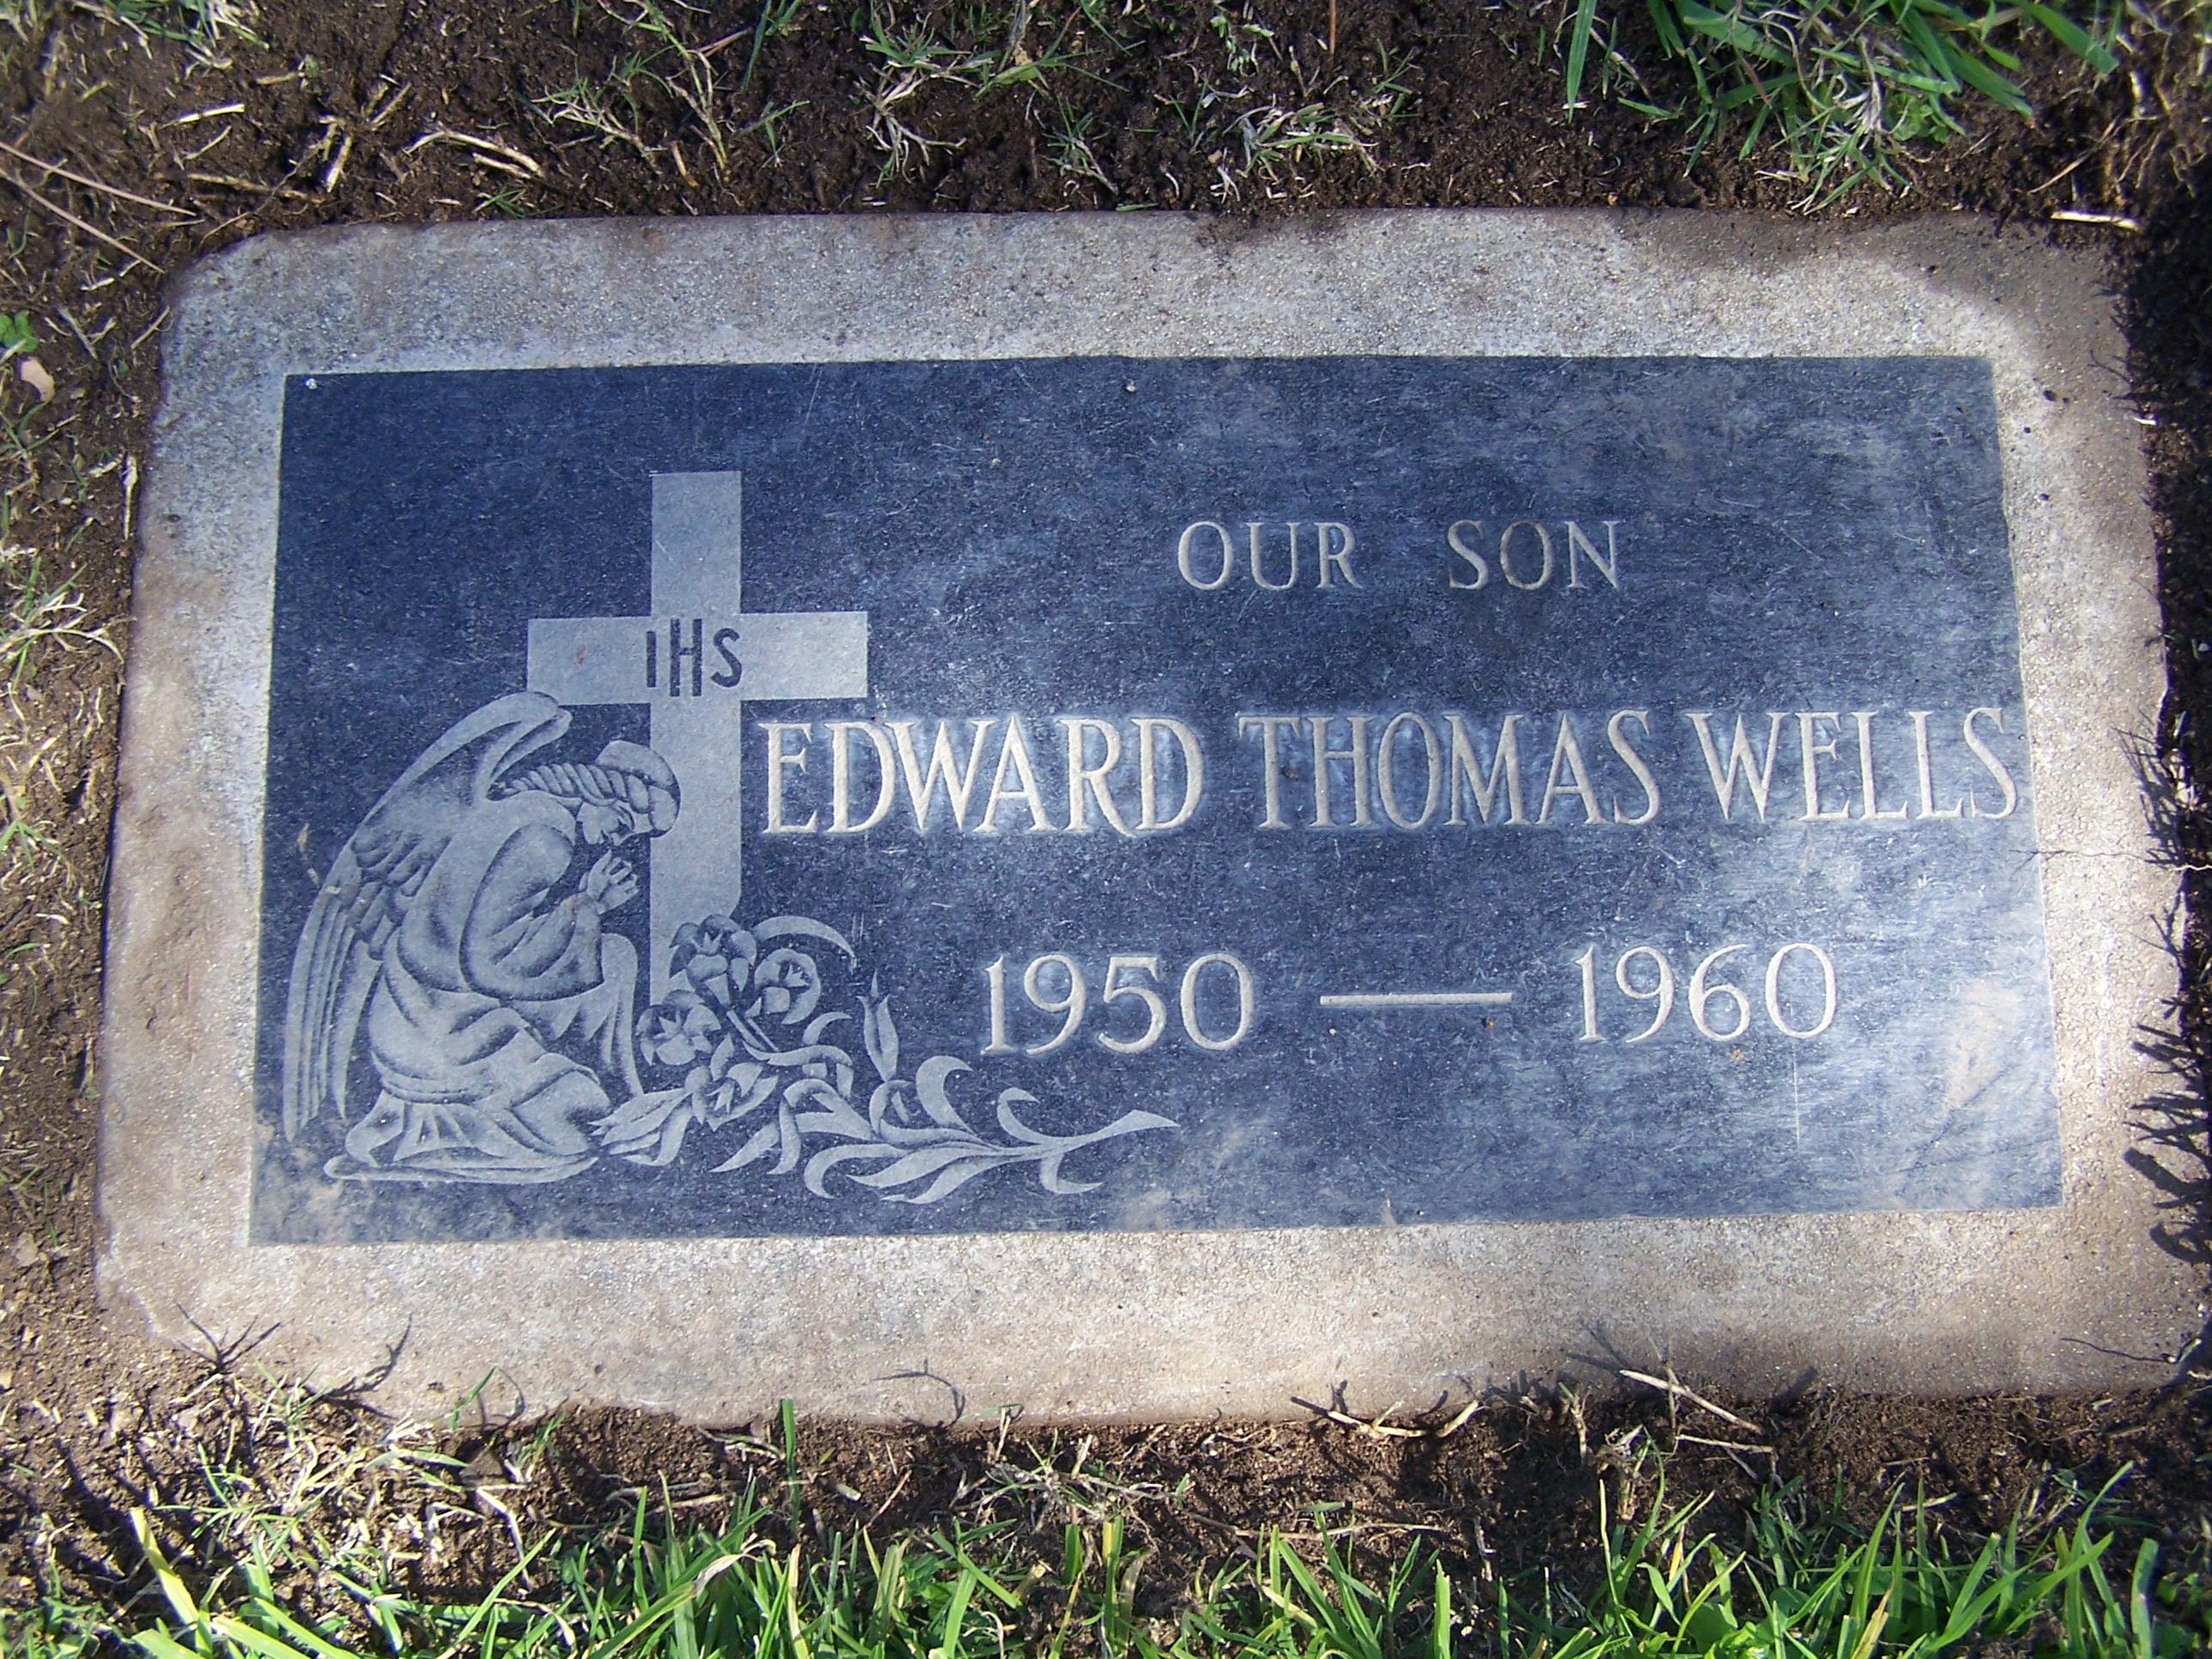 Edward Thomas Wells